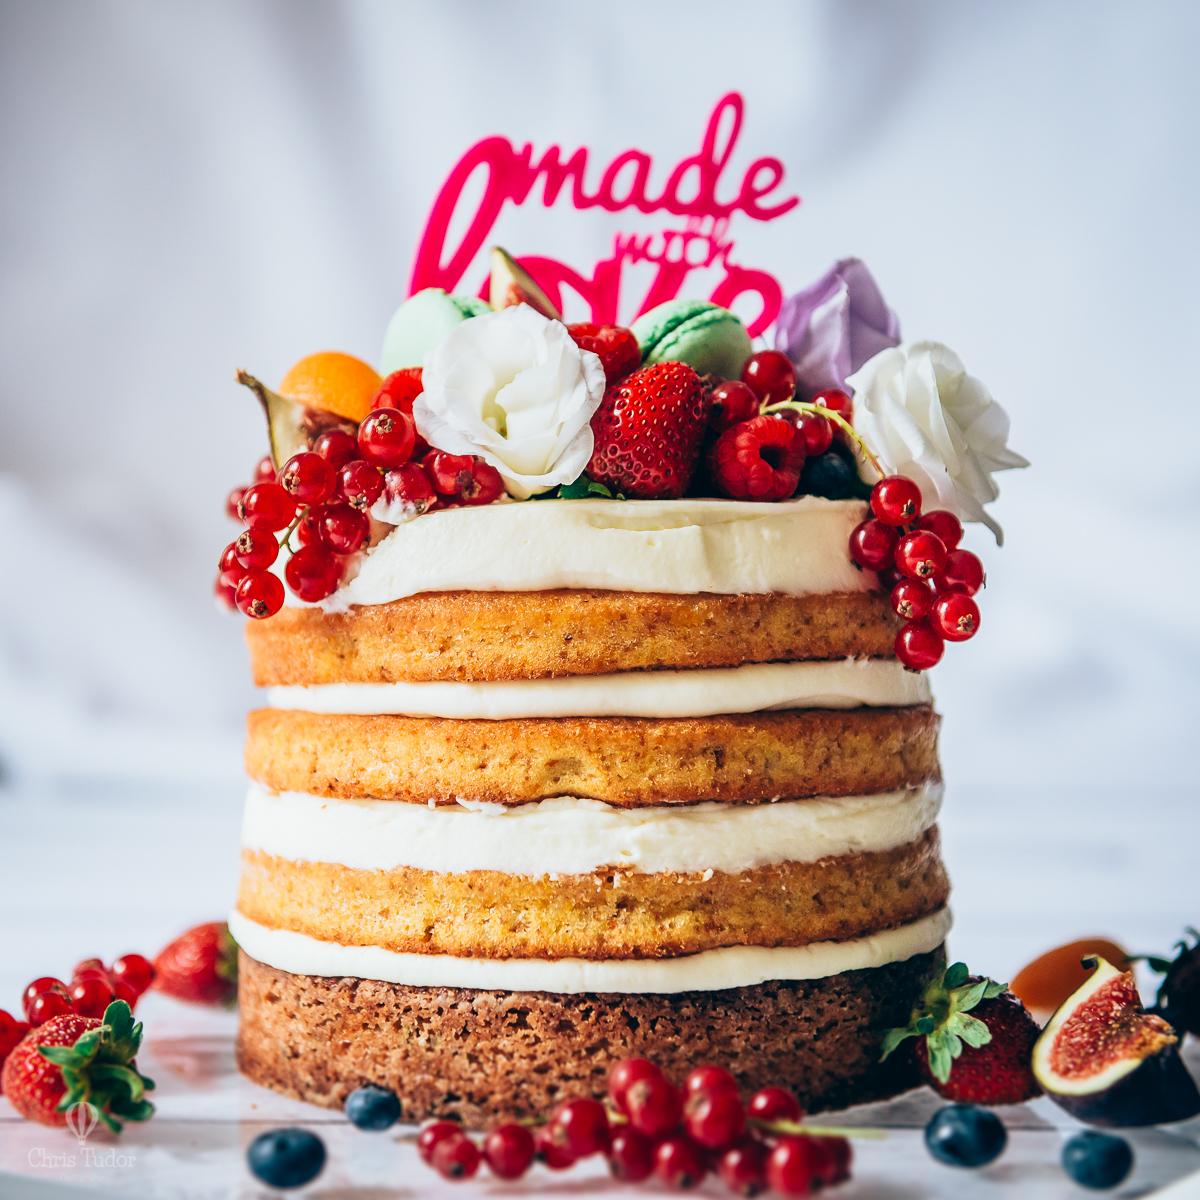 cristina-tudor-food-photography (39).jpg